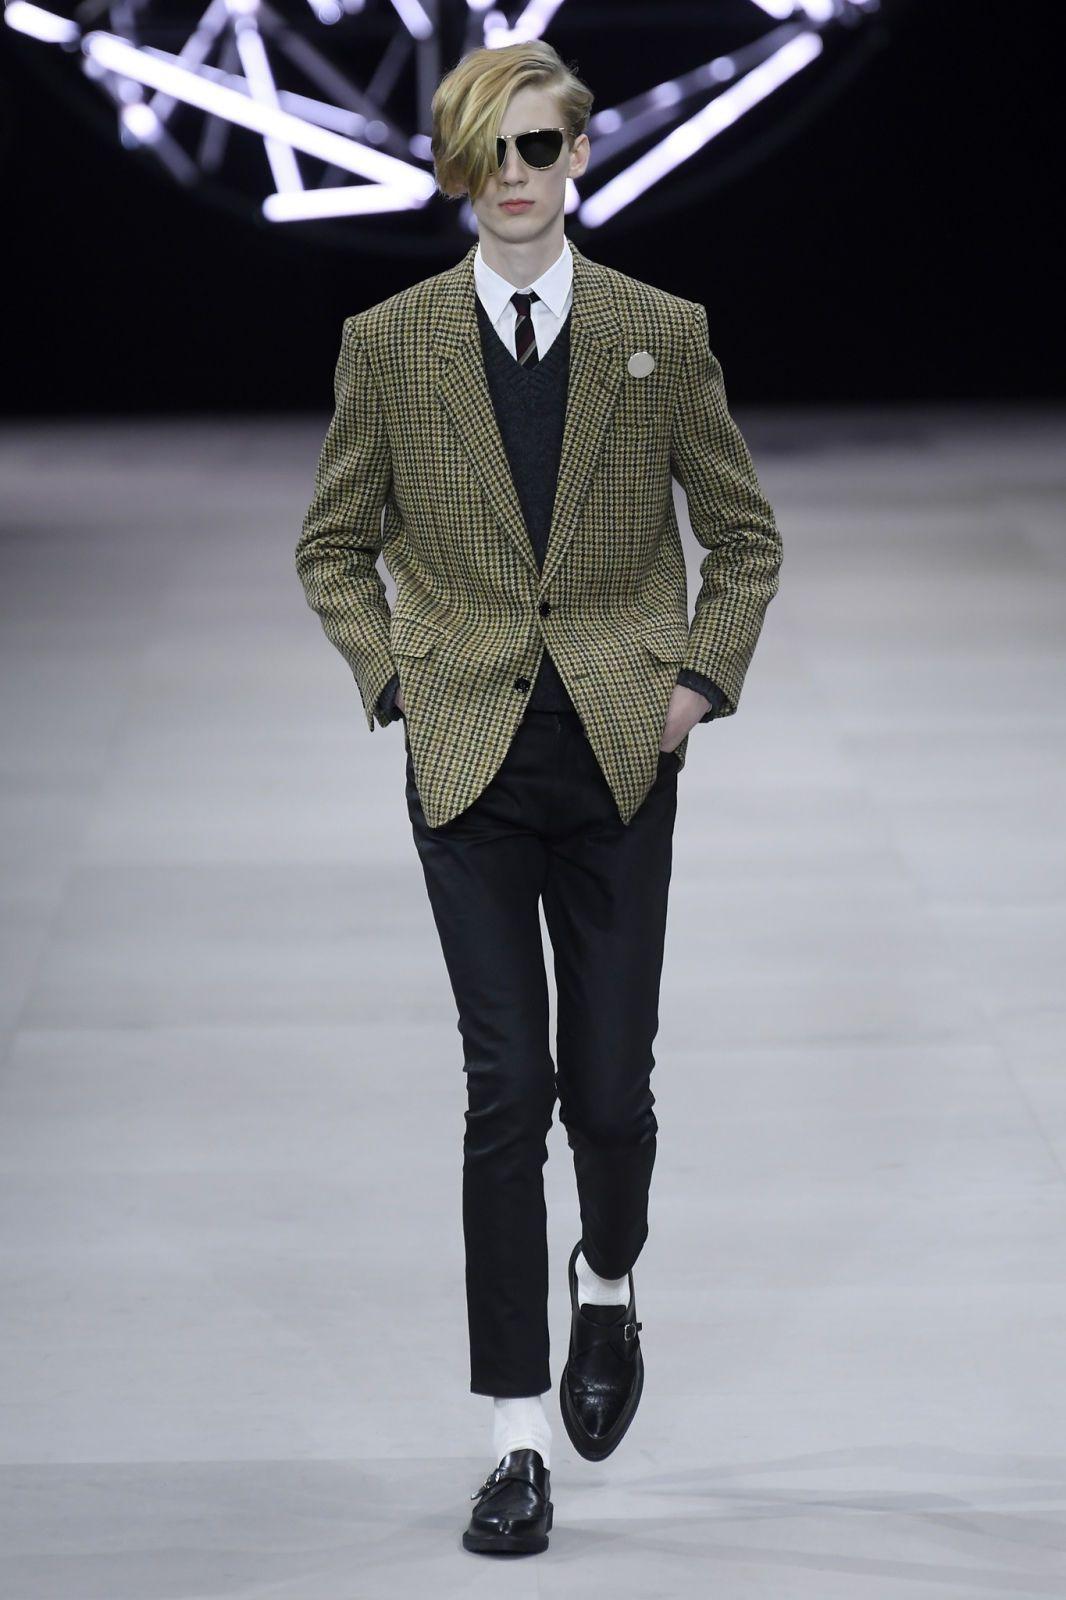 b458fd182ddc CELINE Fall 2019 Menswear Paris Collection | Fall 2019【2019 ...